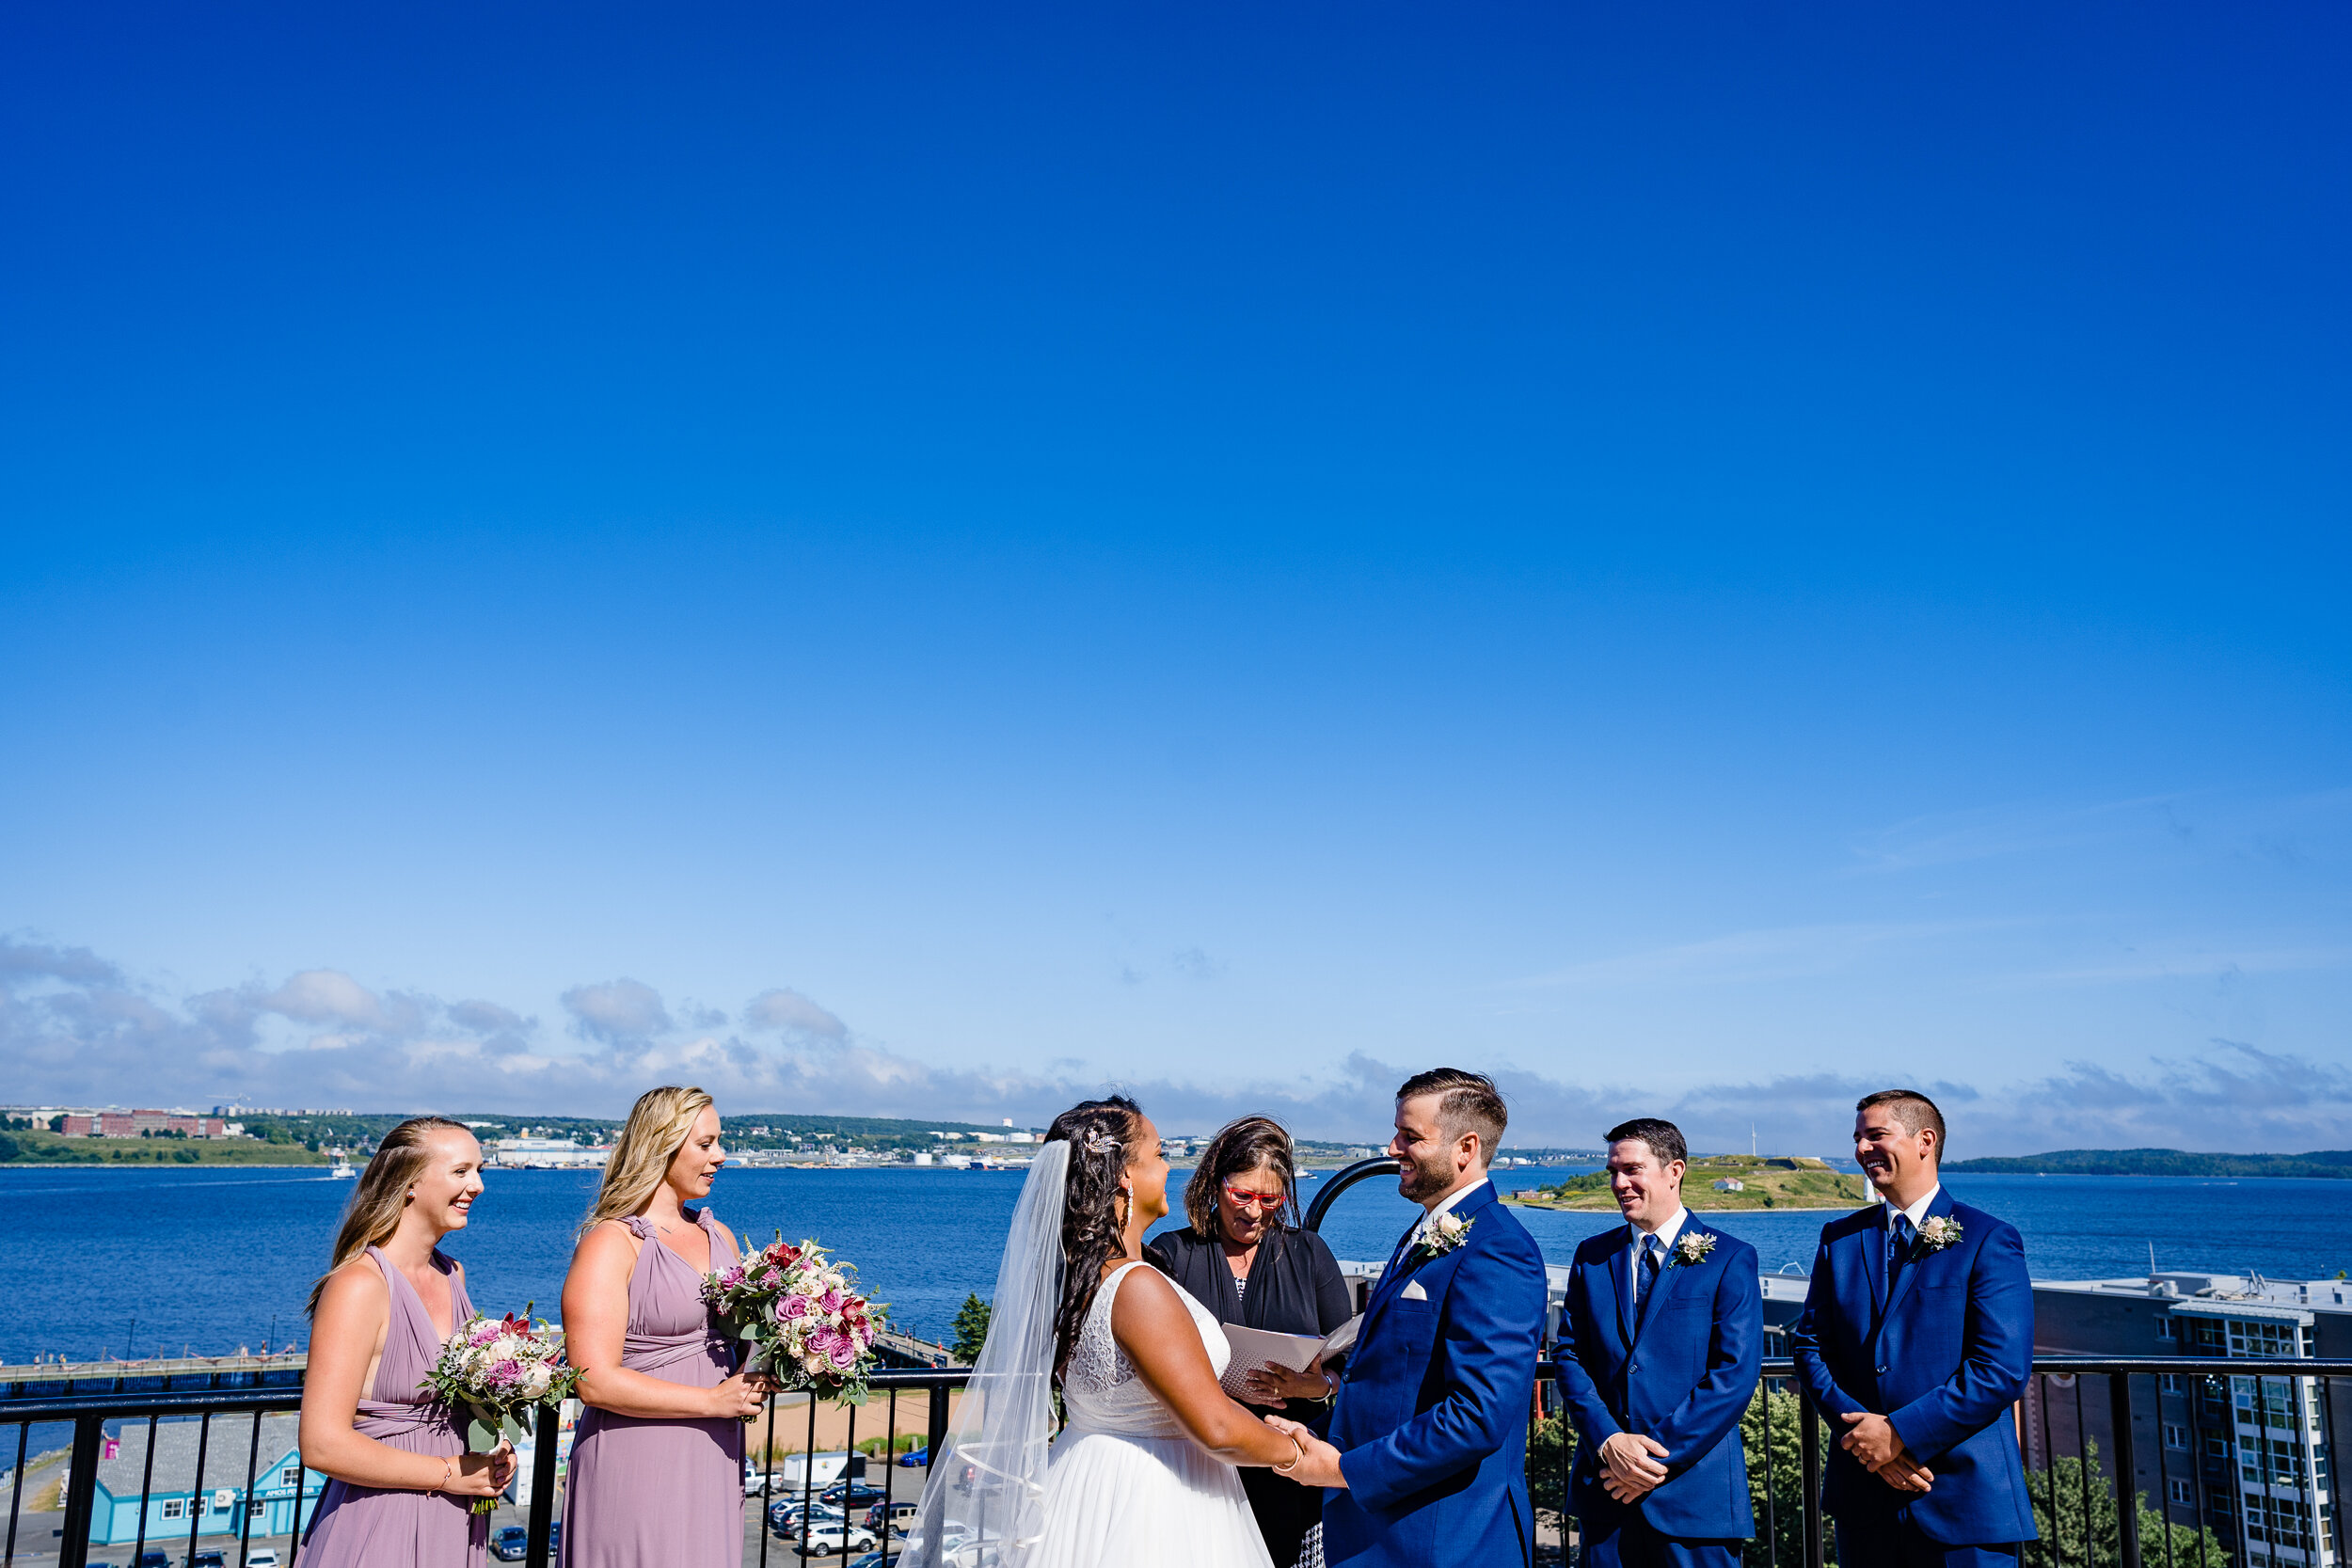 courtyard-marriot-wedding-halifax-10.jpg